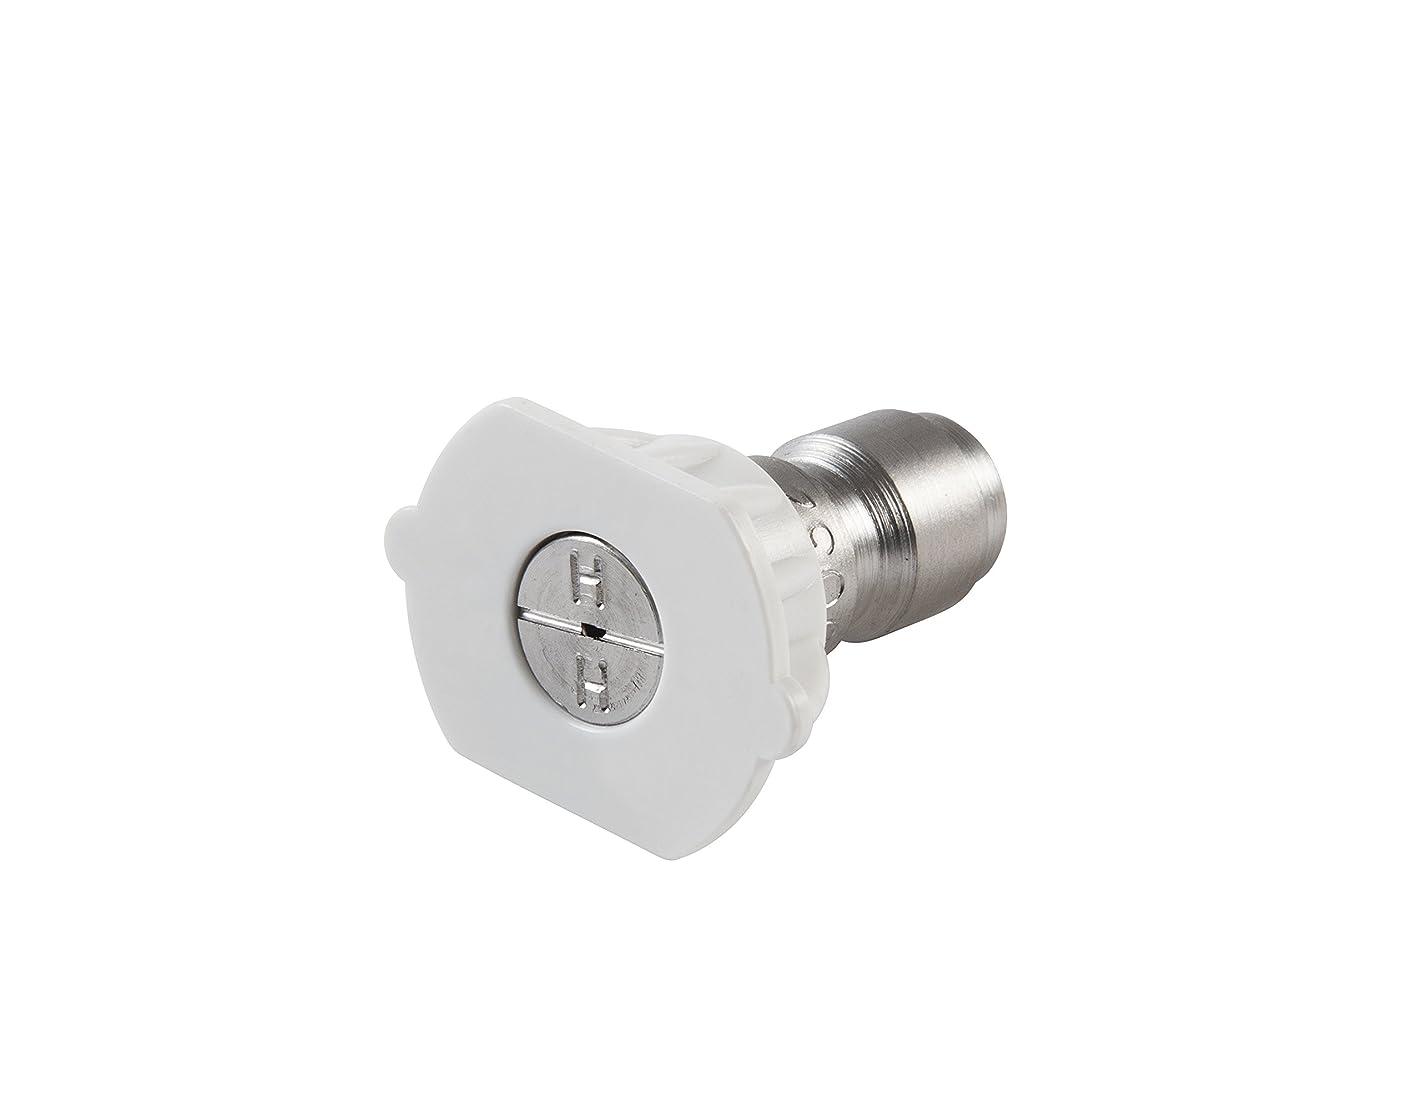 Karcher Gas Pressure Washer Spray Nozzle, 40 Degree